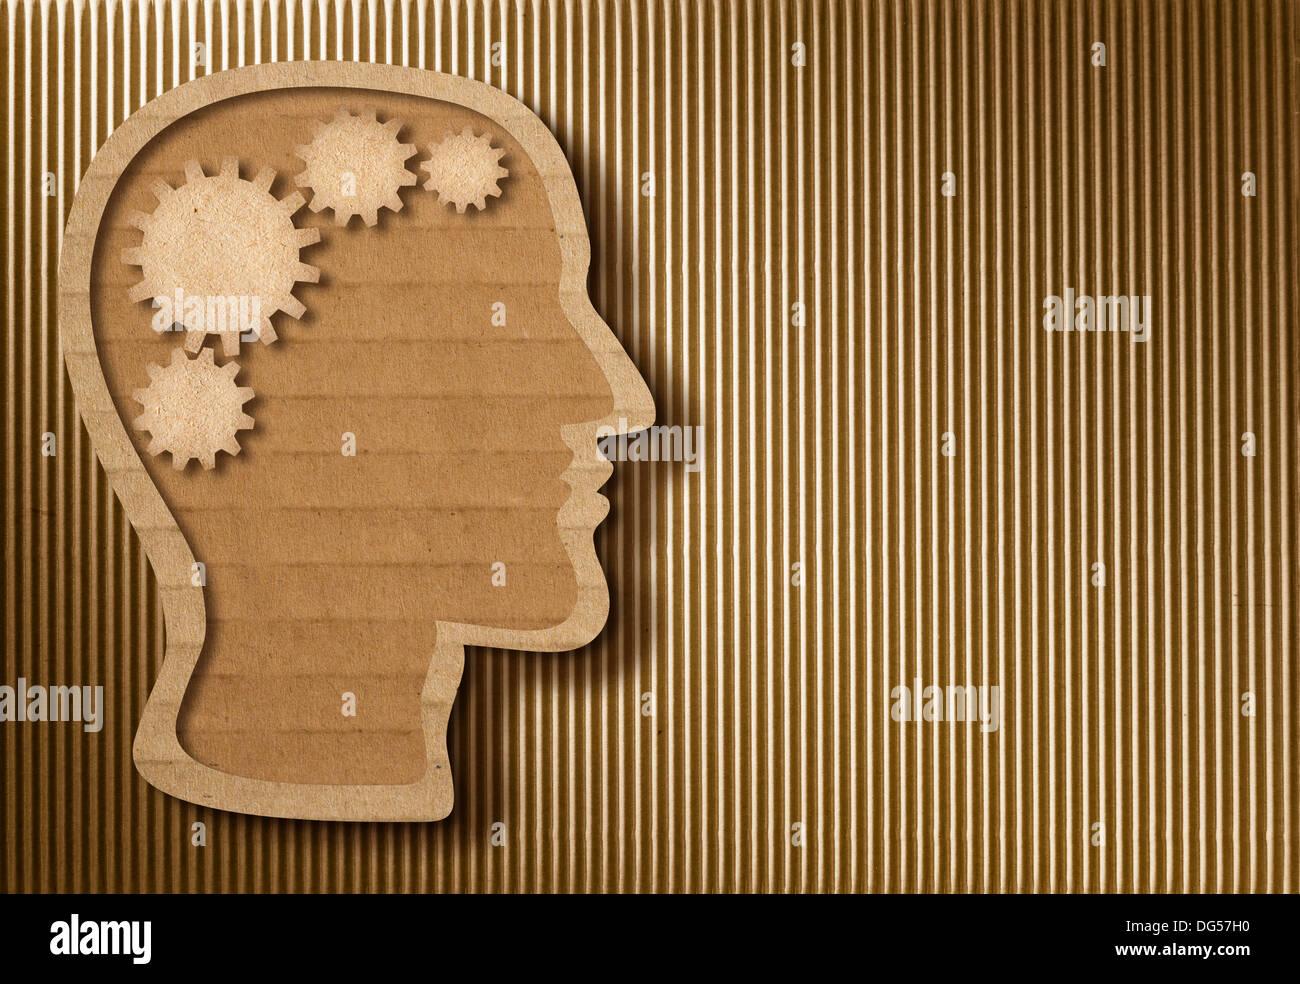 Human head model made from cardboard - Stock Image